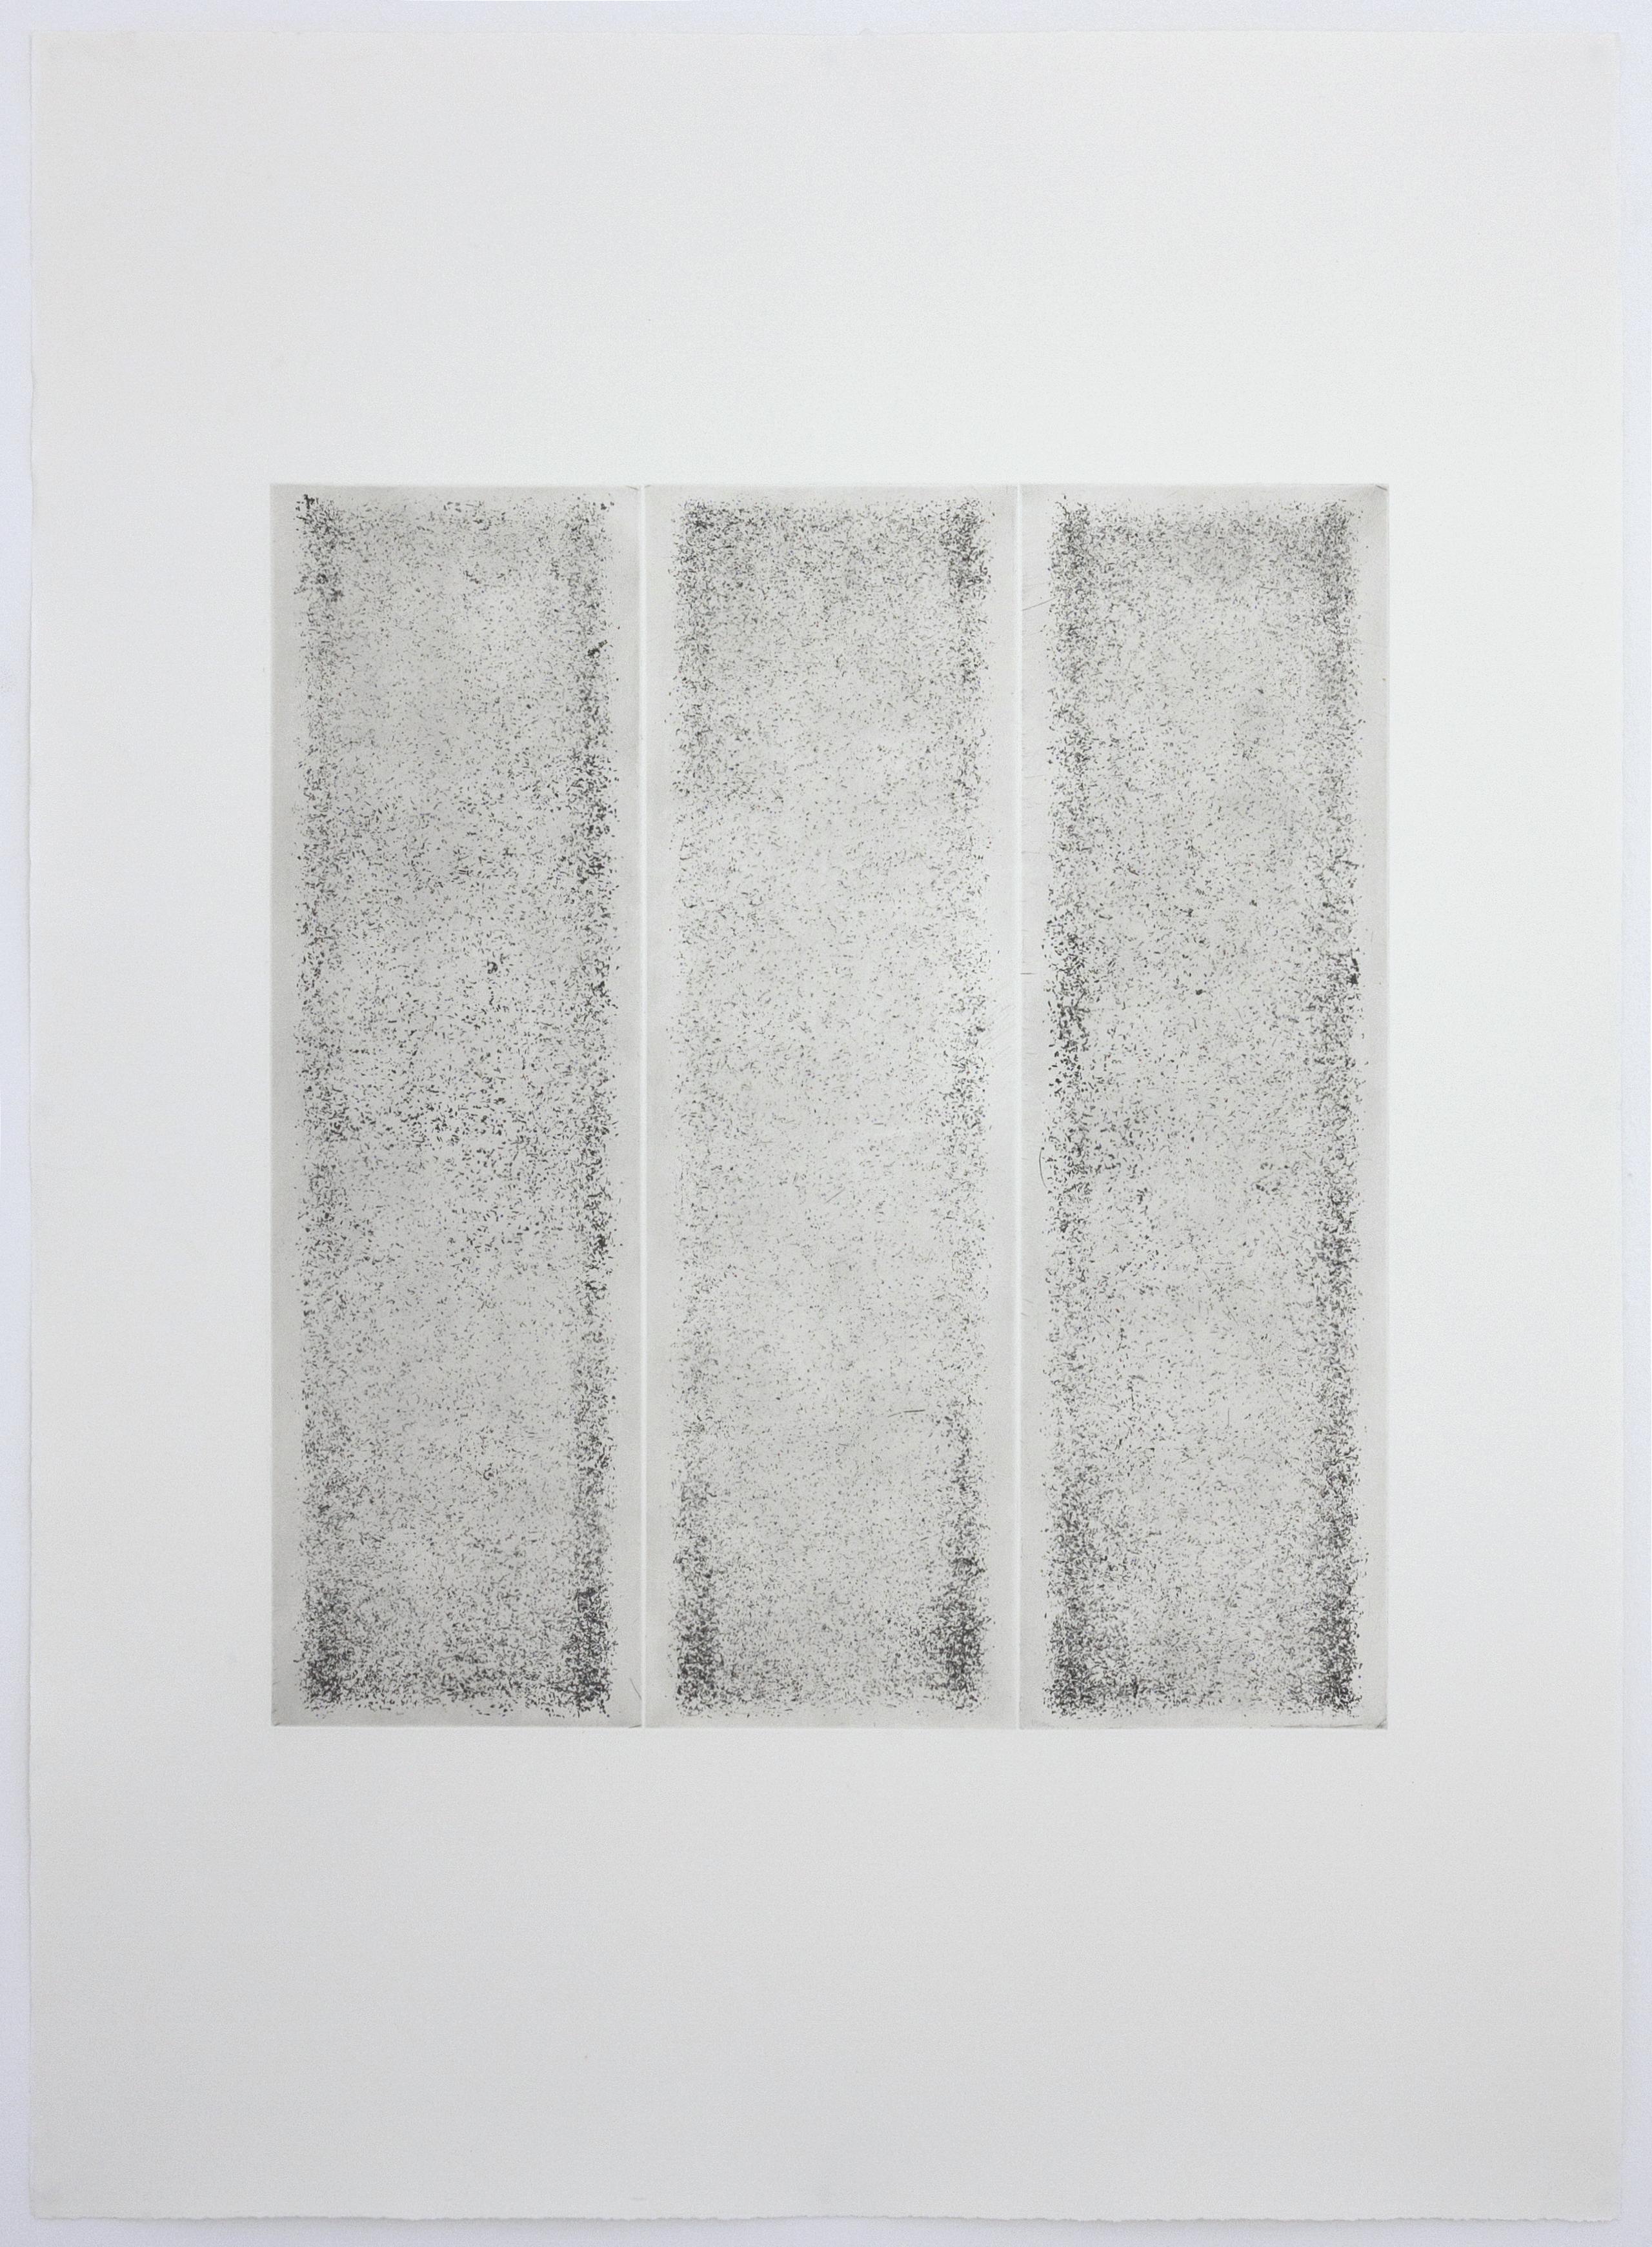 Christian Nerf, Prints